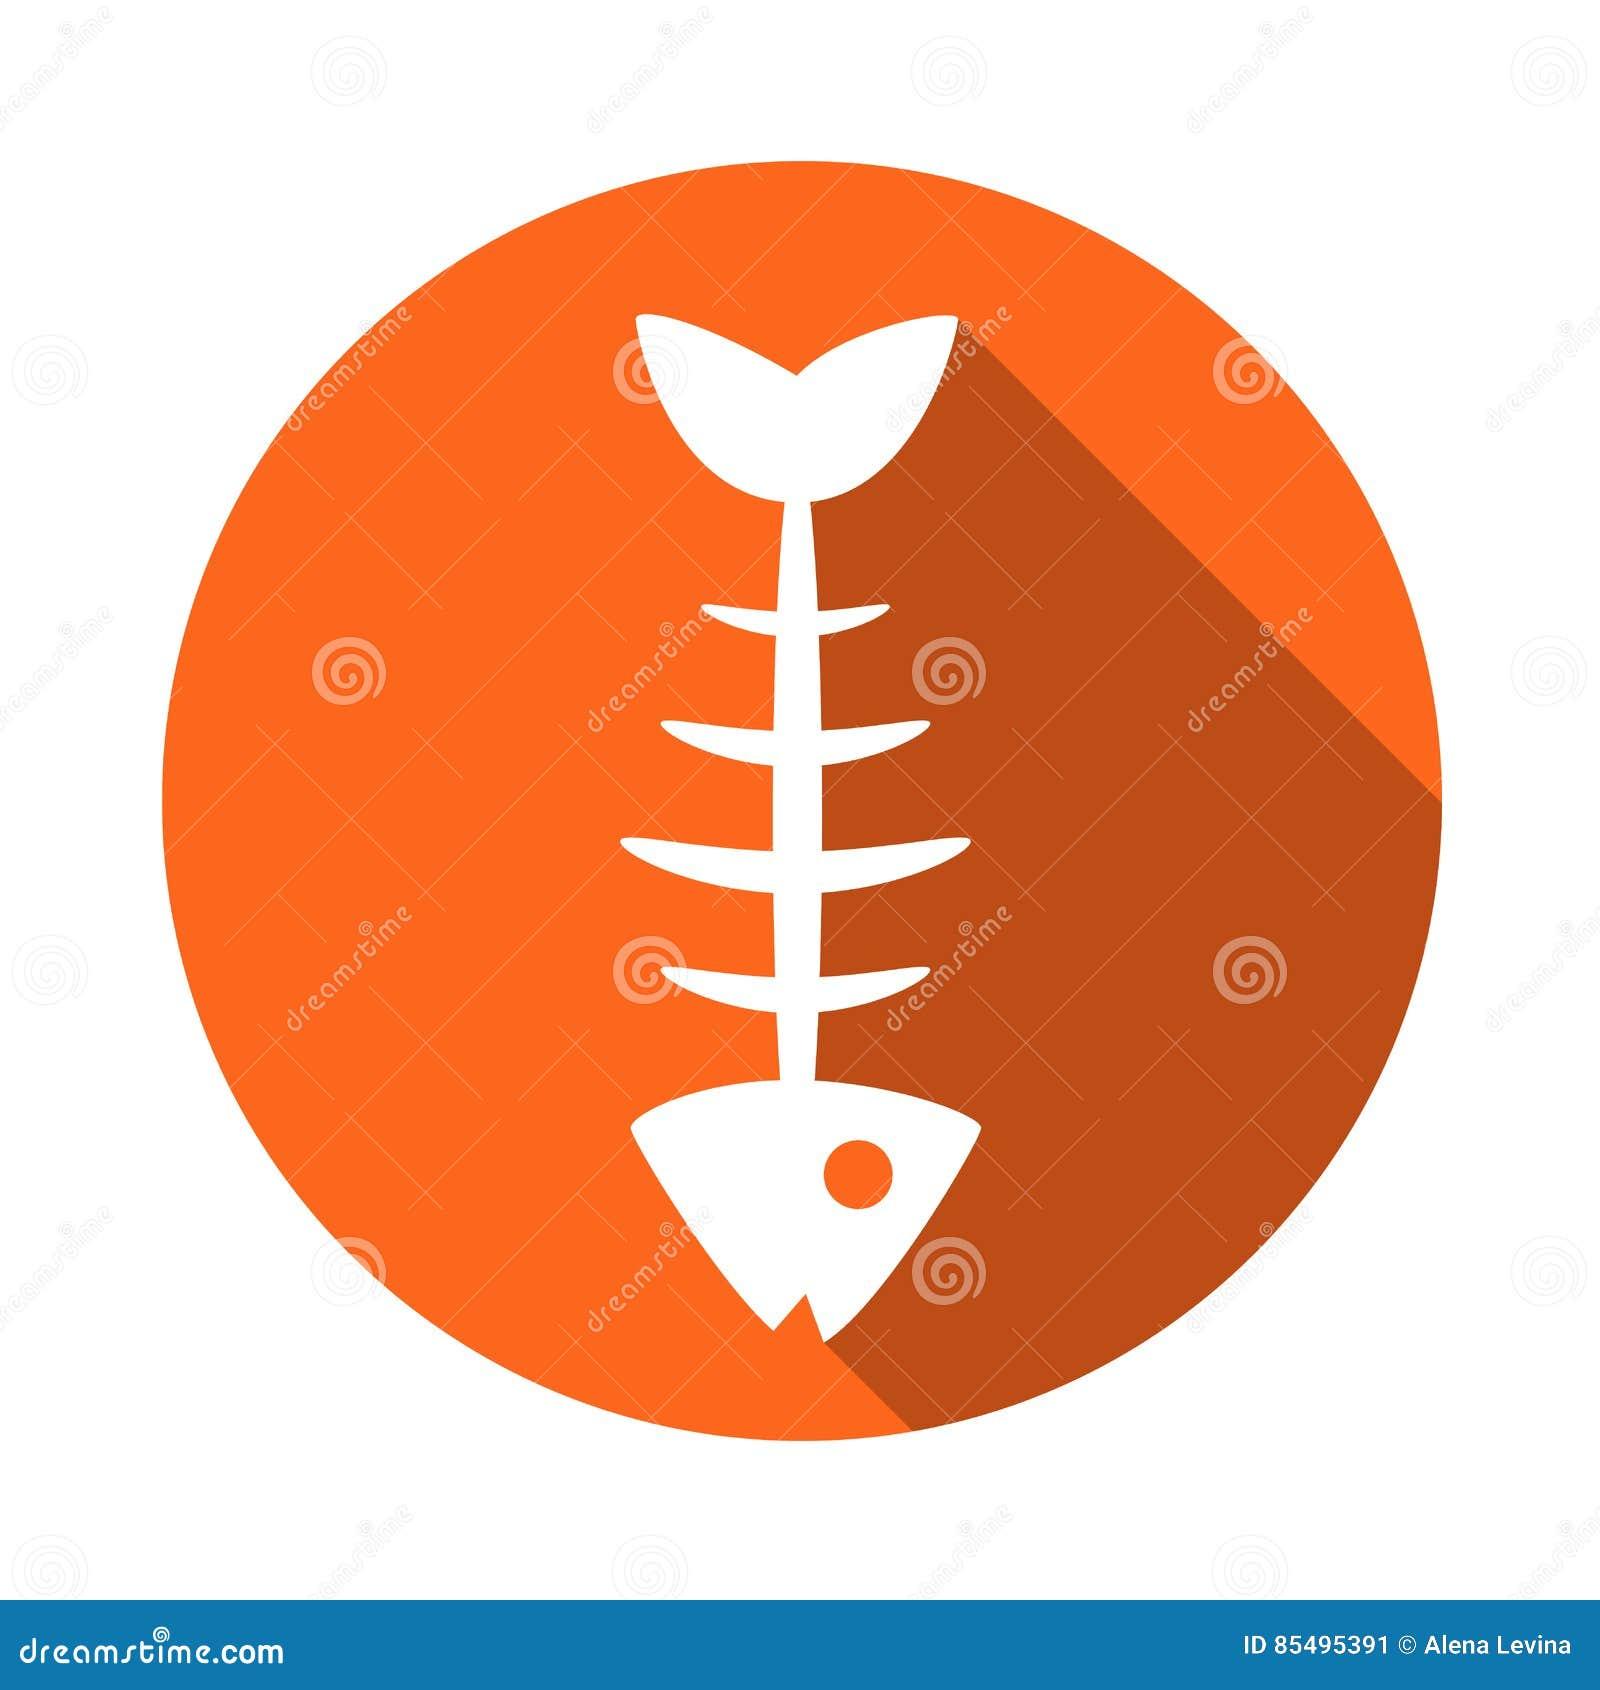 Fish icon . The icon of the fish bones. Fish skeleton icon. Fishing icon